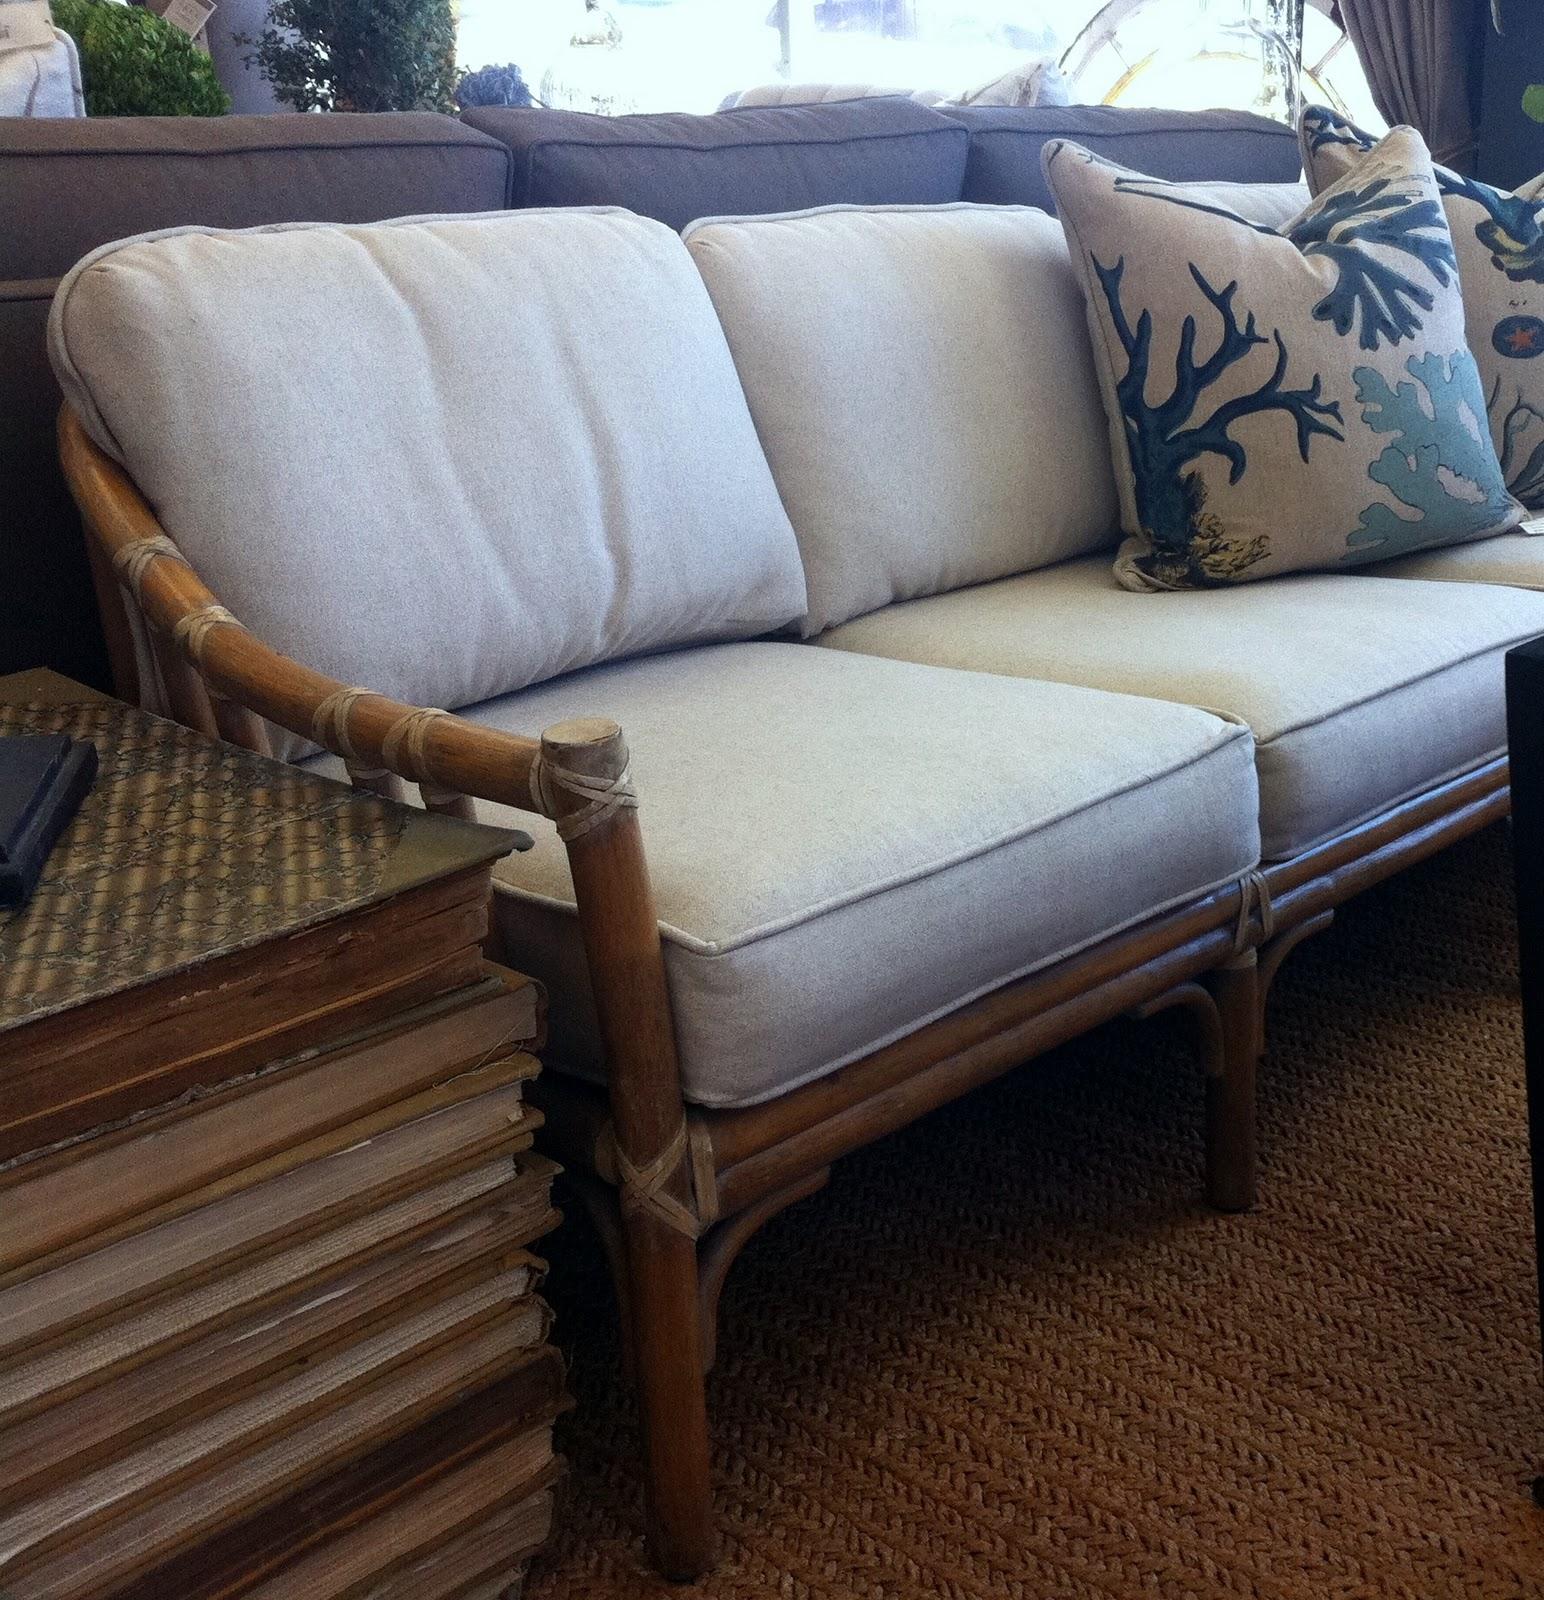 Merveilleux Vintage McGuire Sofa Original Price $1200 Sale Price $960